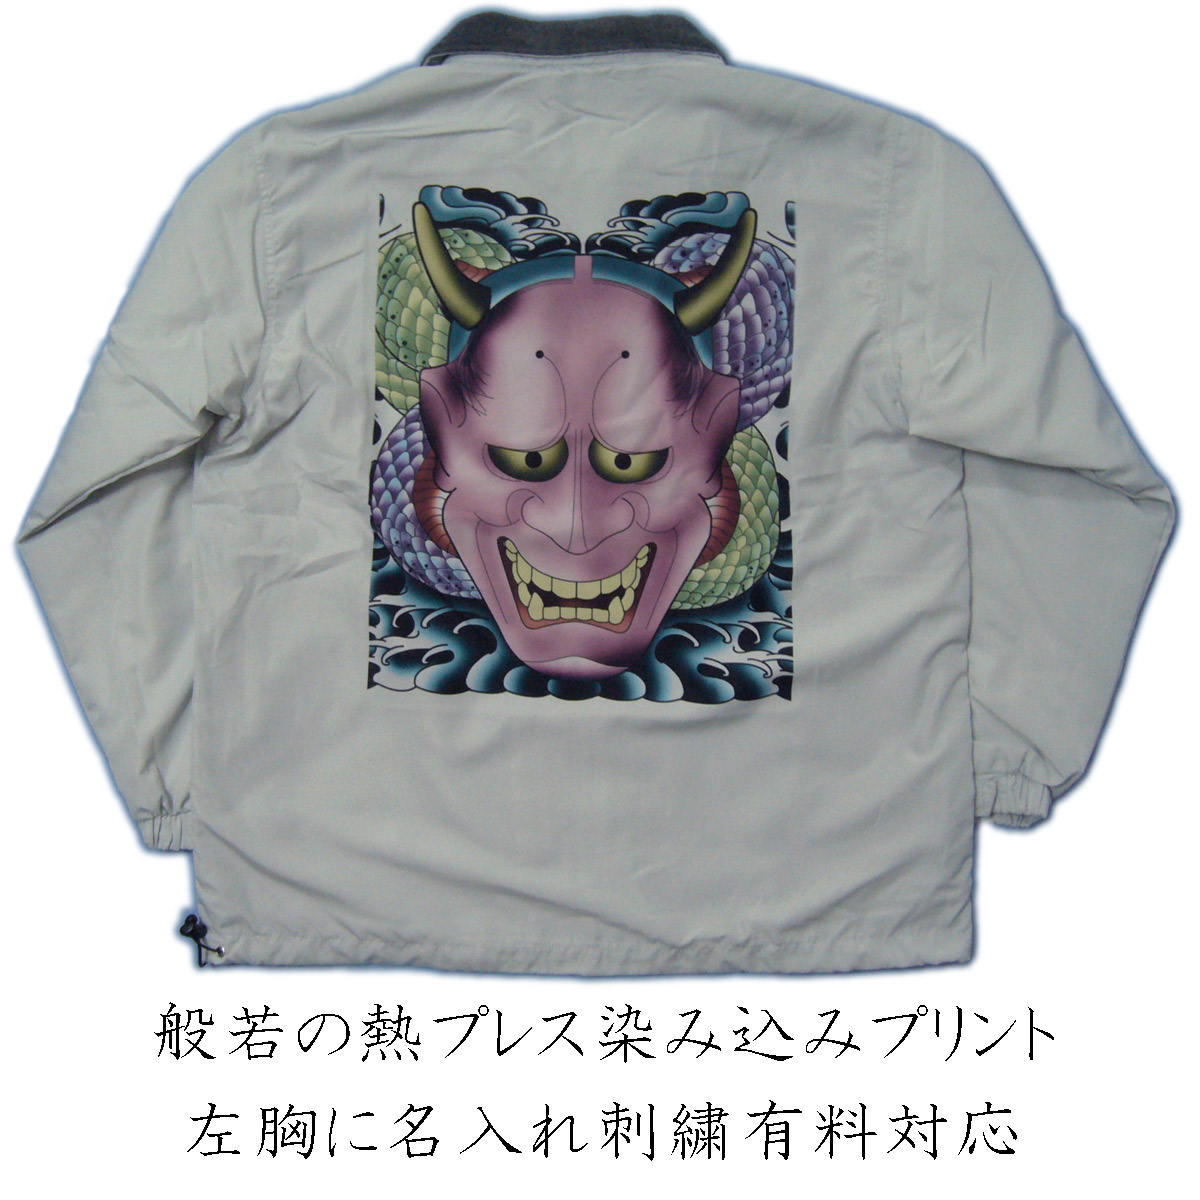 kuziyaku: Put the Dongen Japanese pattern Tobi clothes hannya back ...